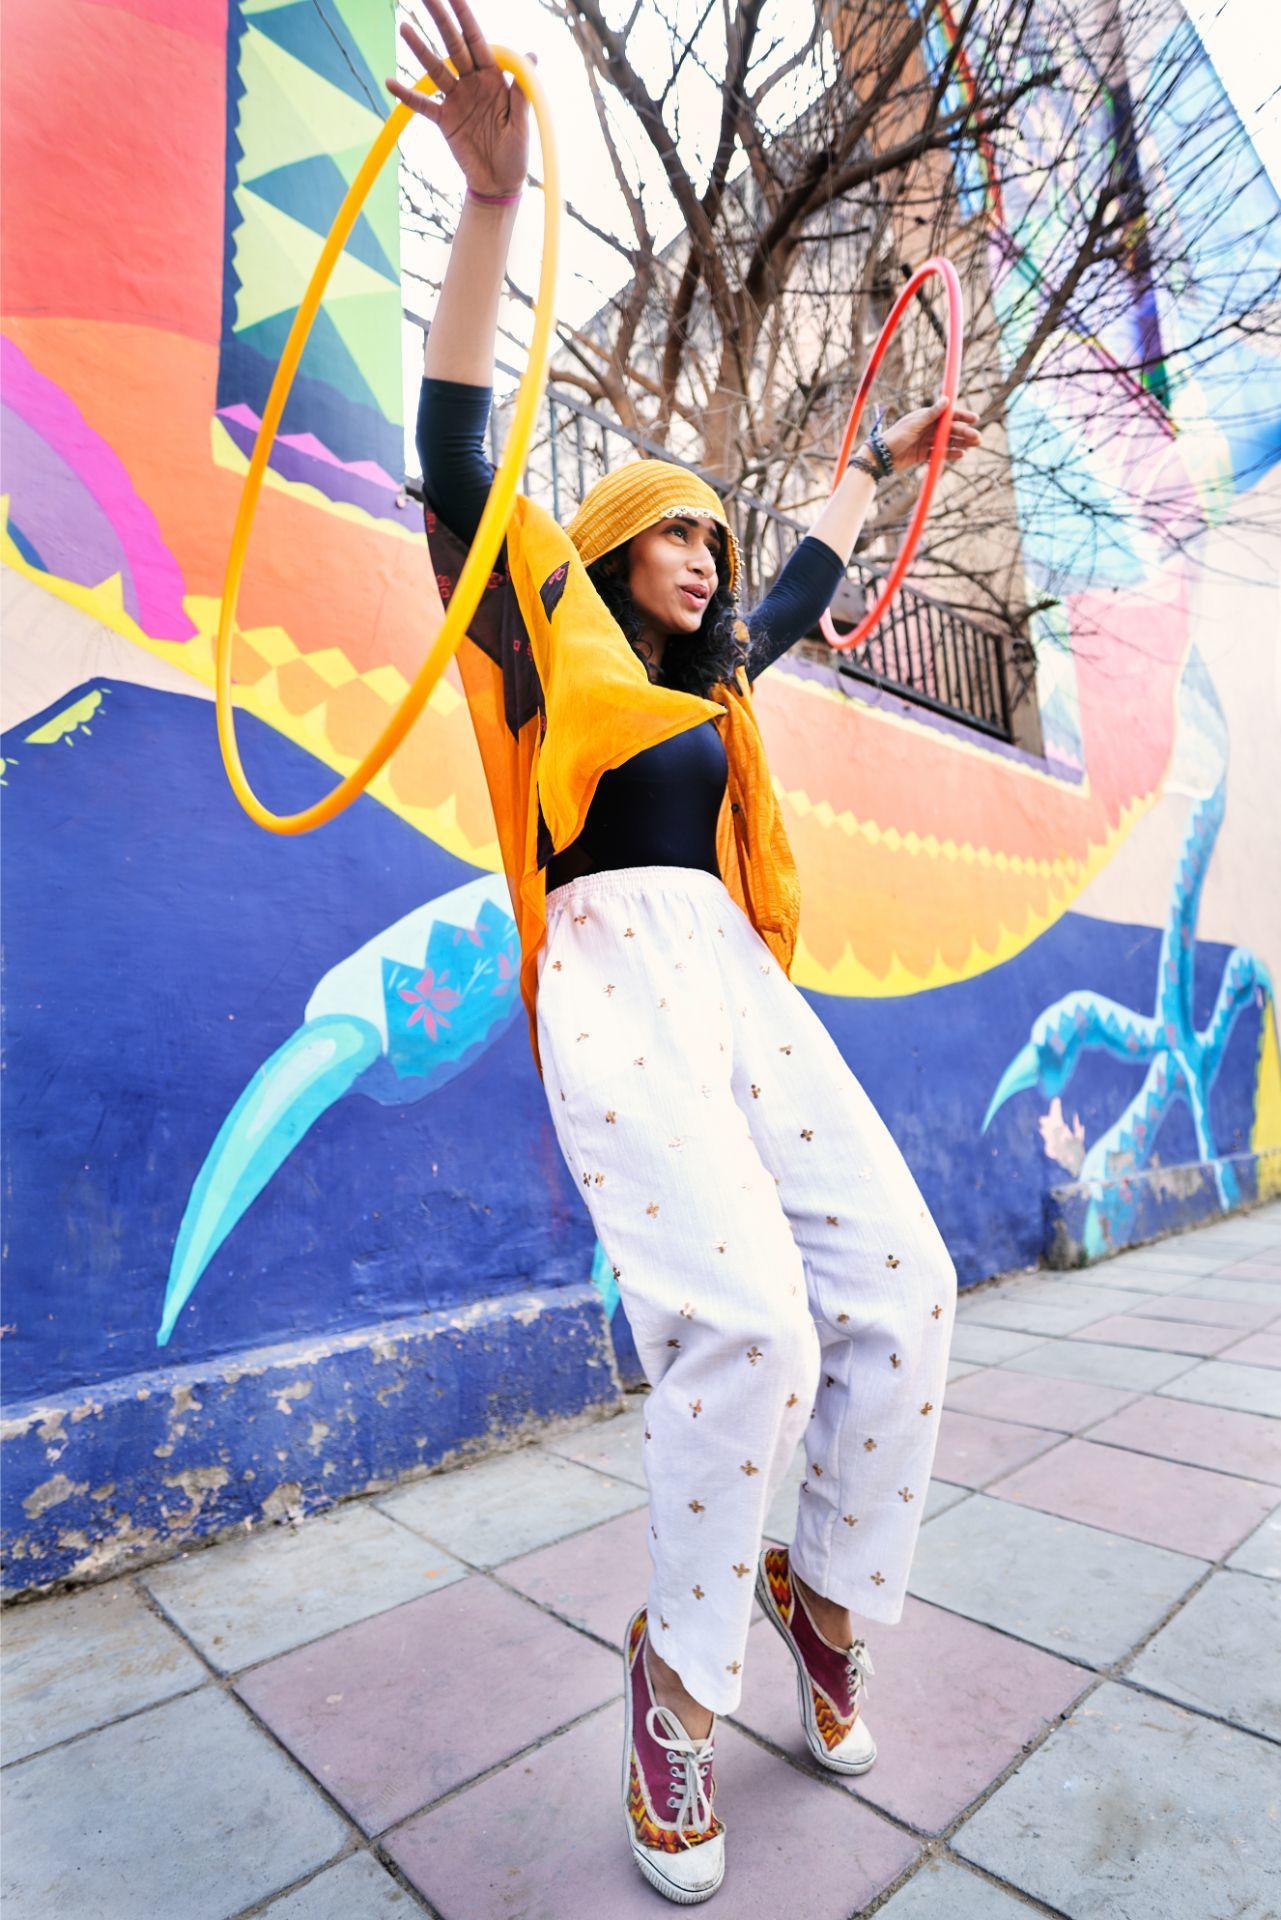 Dance hoop hula clothing waacko graffiti